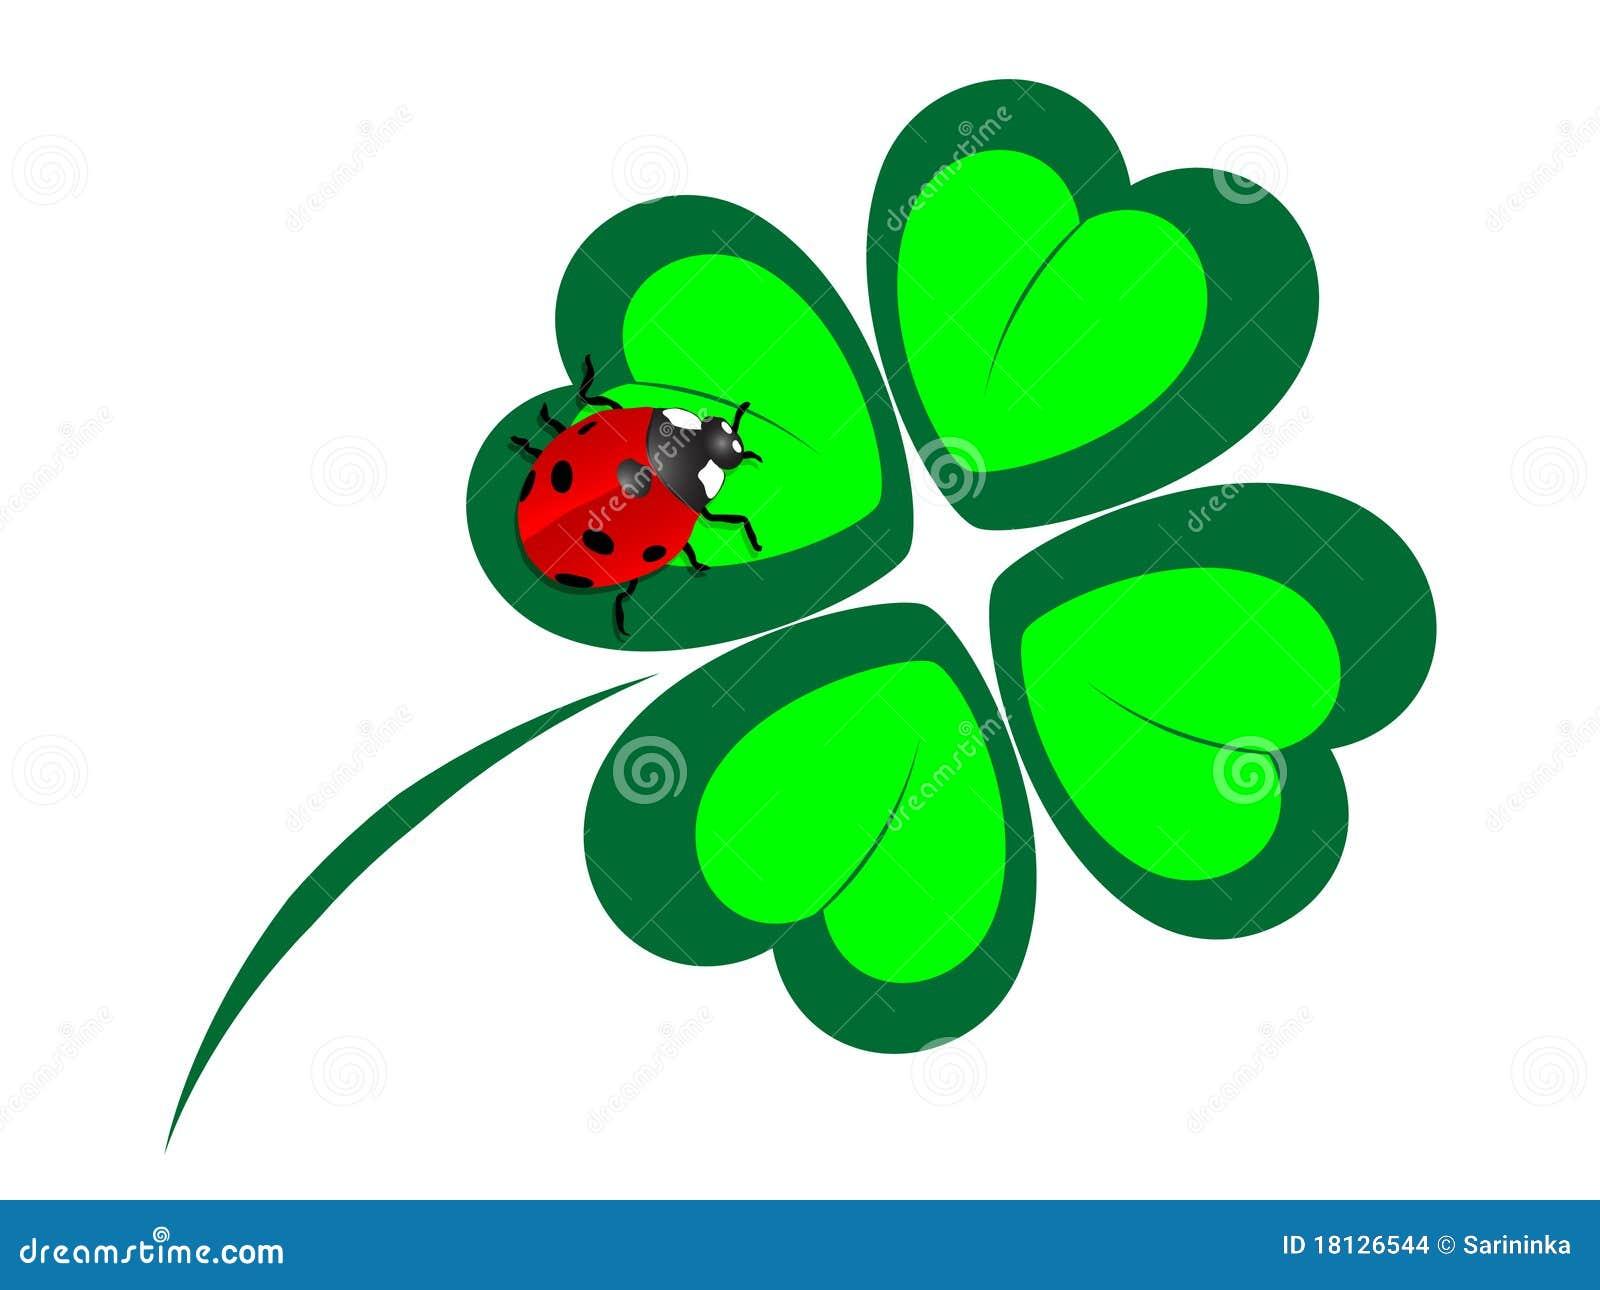 Four Leaf Clover Stock Images - Image: 18126544